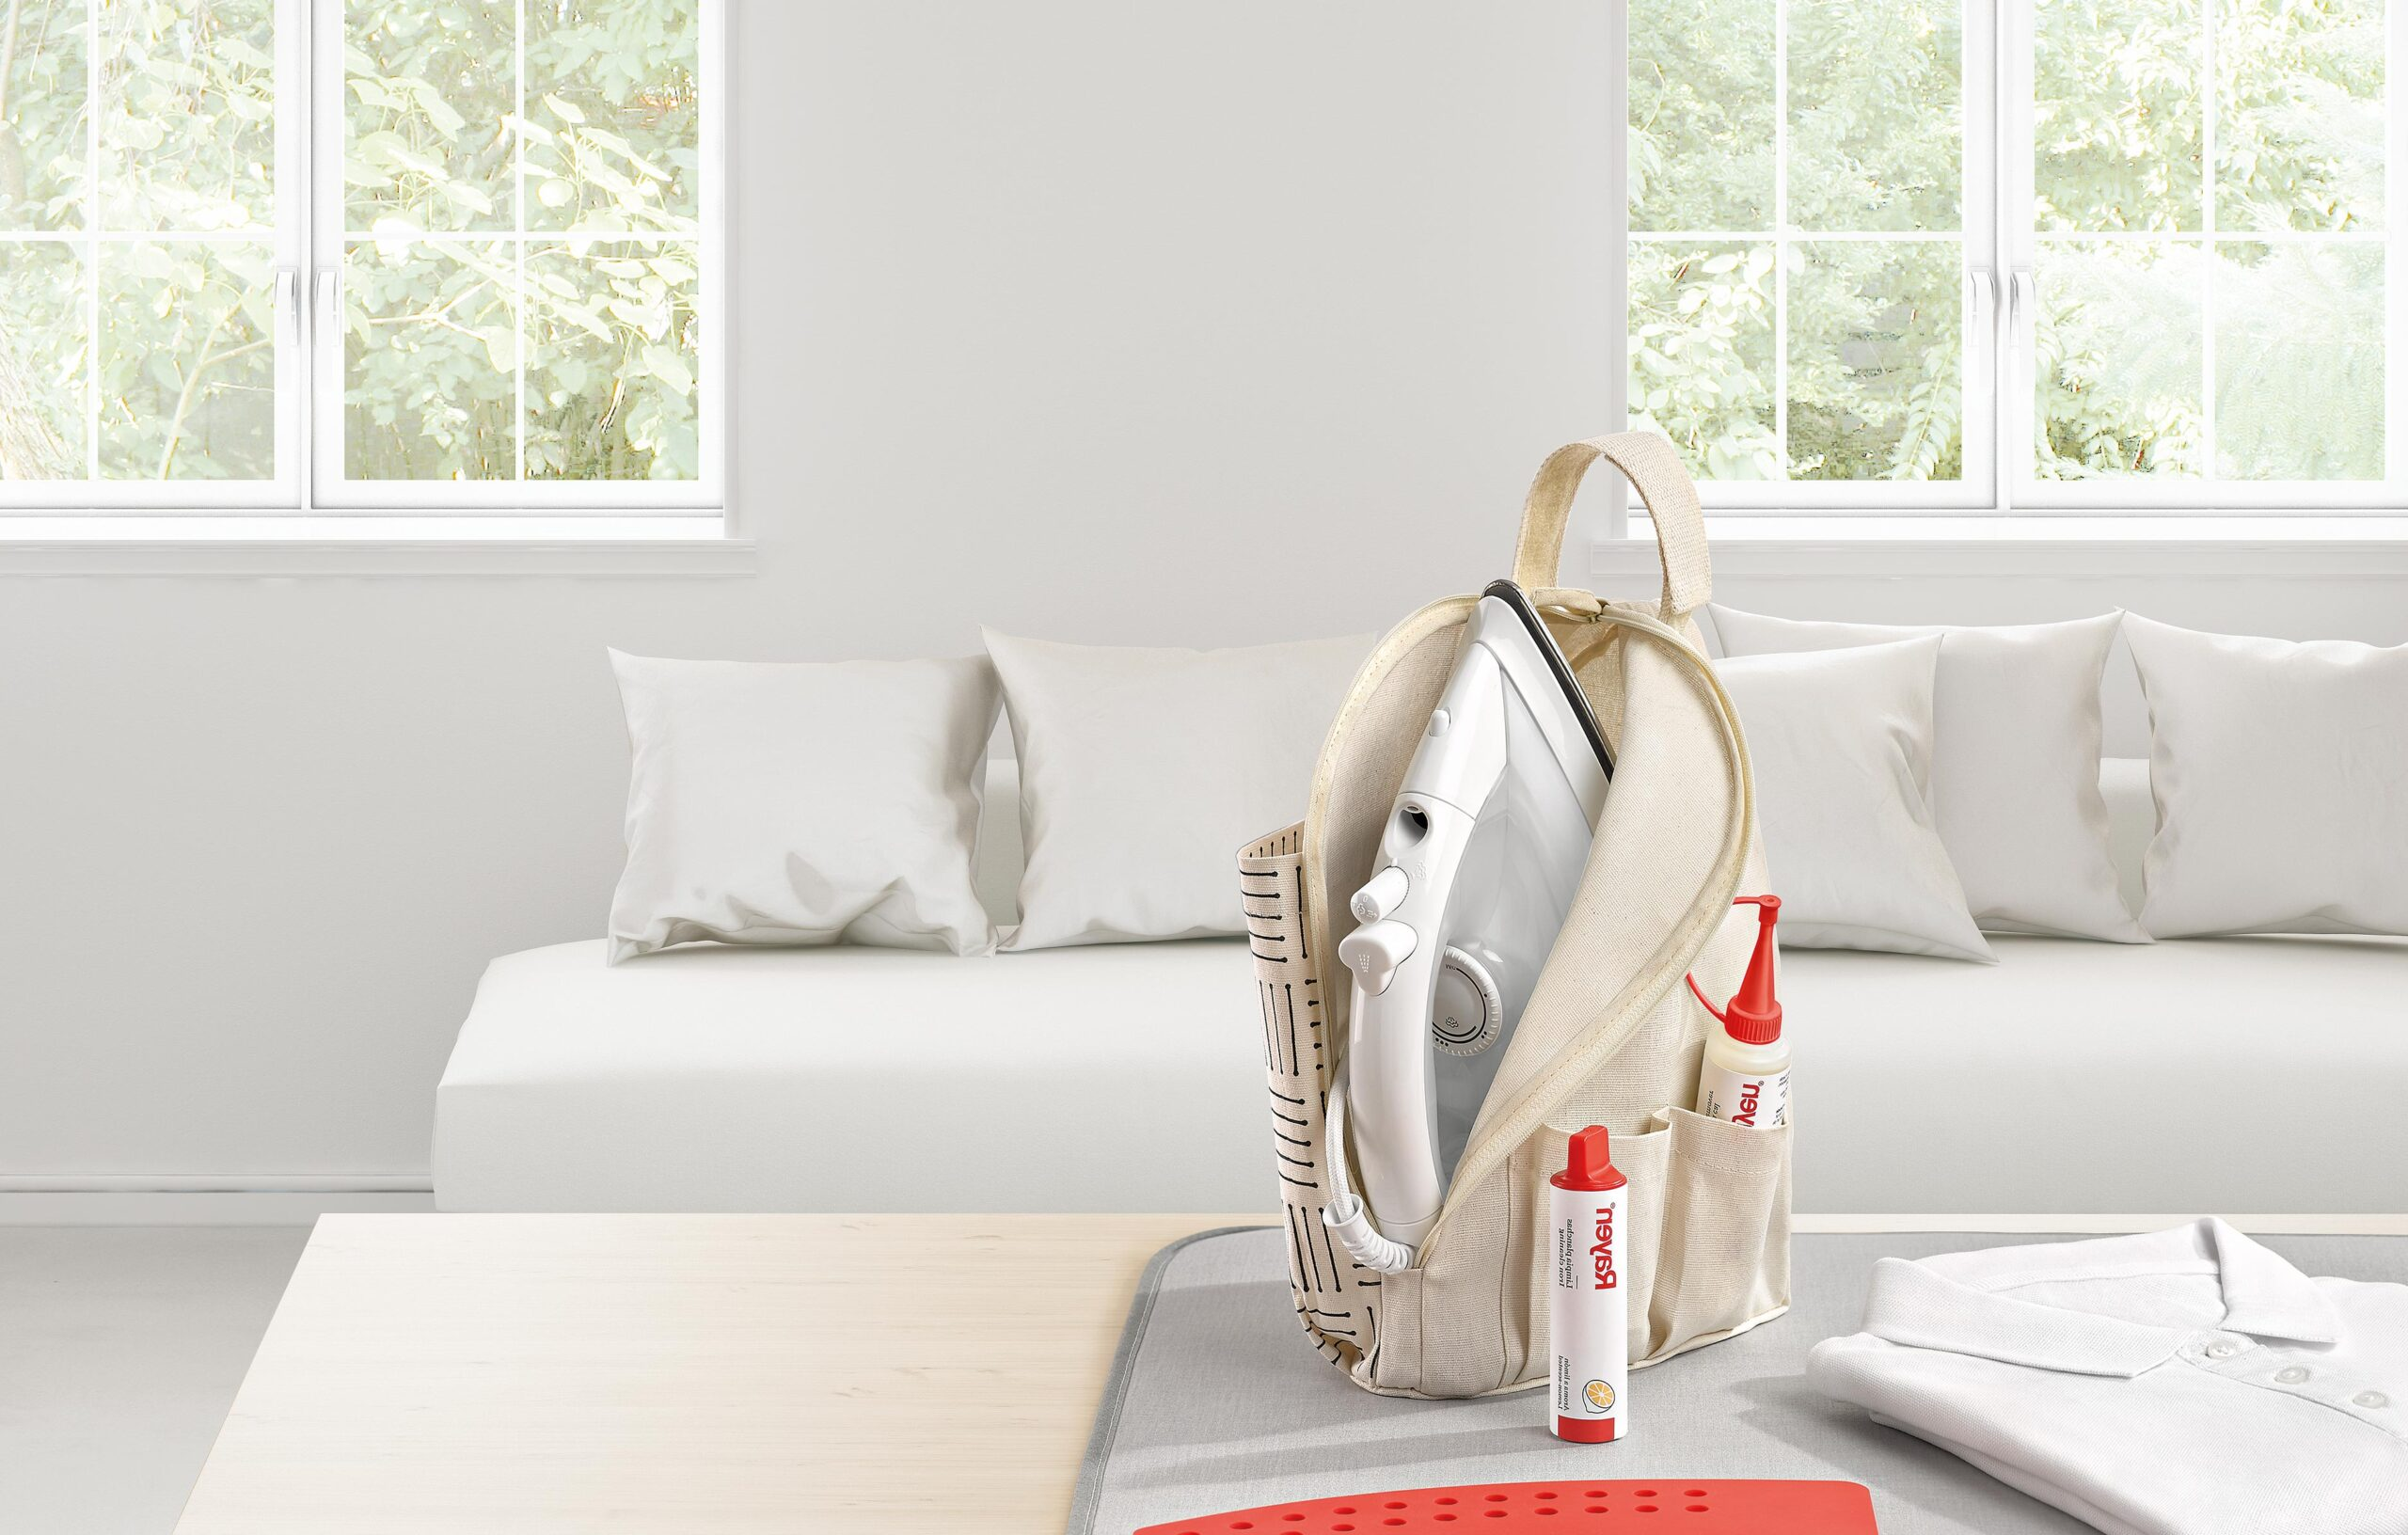 slider2-b-scaled Rayen | Soluciones innovadoras para el hogar | Accesorios plancha | Rayen.com